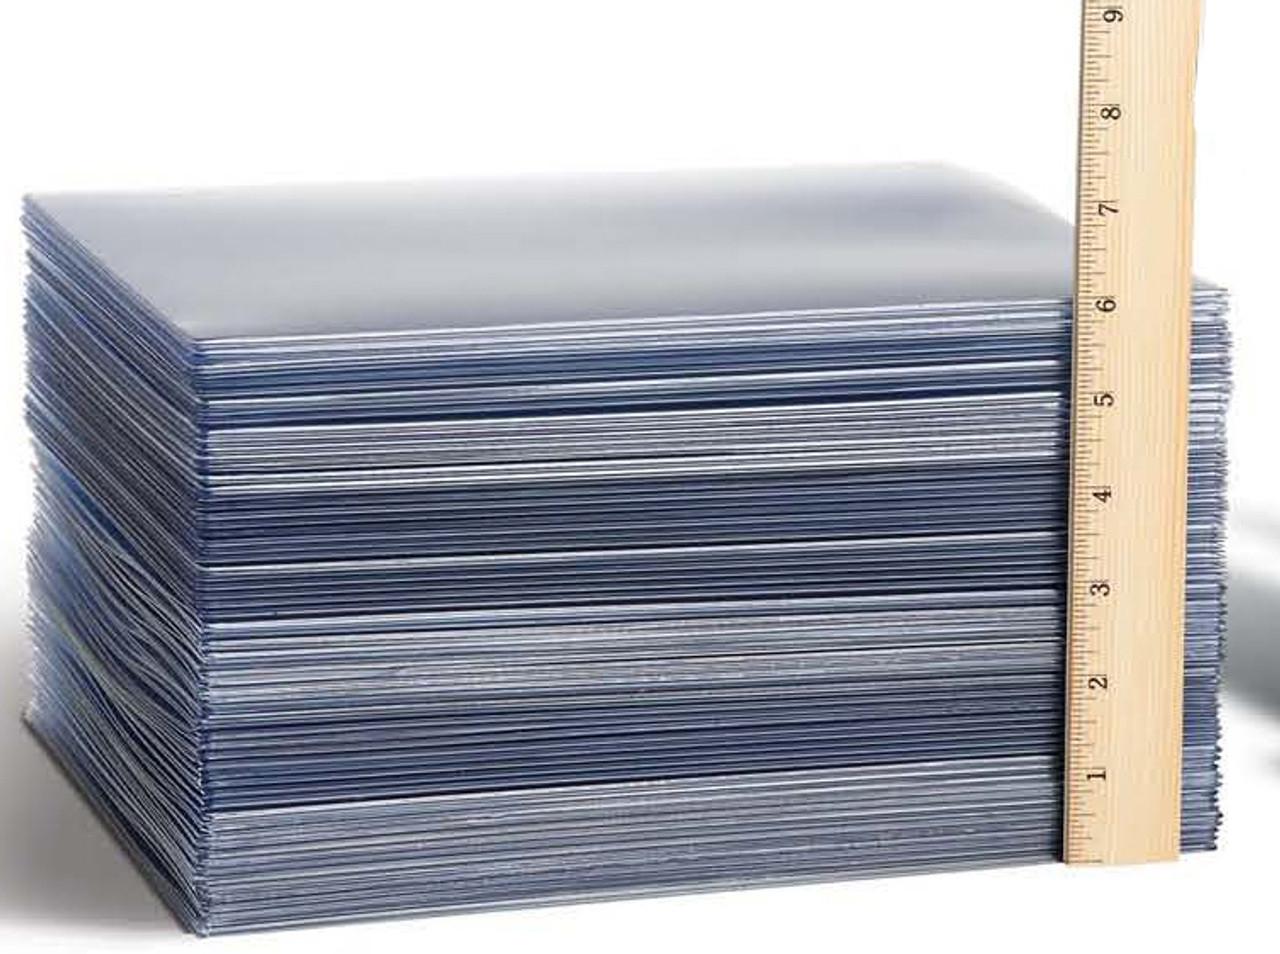 DocU-Sleeve - stack of 60